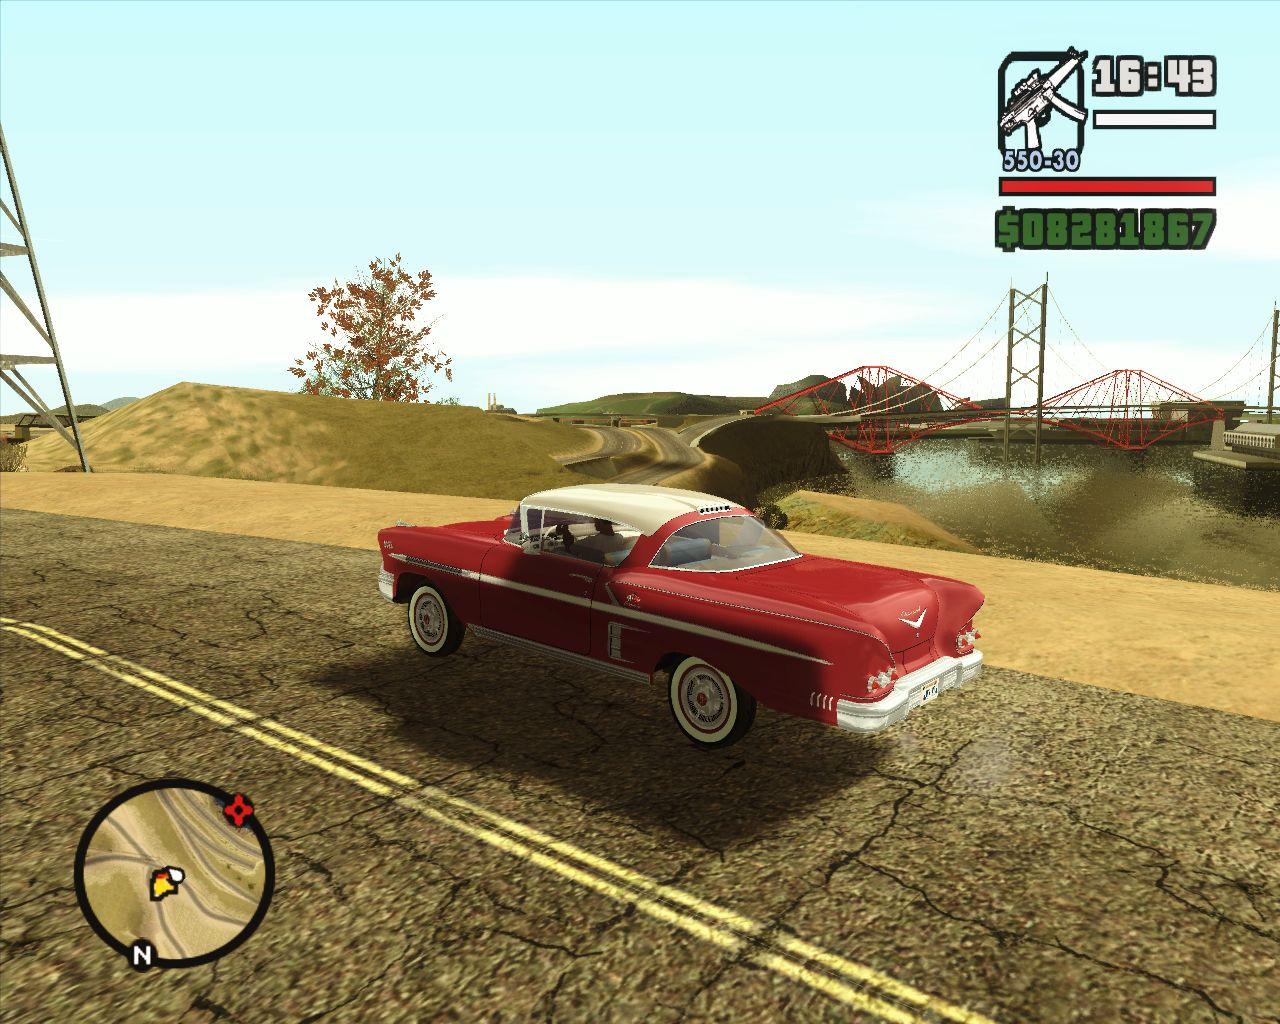 gta_sa 2008-04-12 17-38-44-10.jpg - Grand Theft Auto: San Andreas